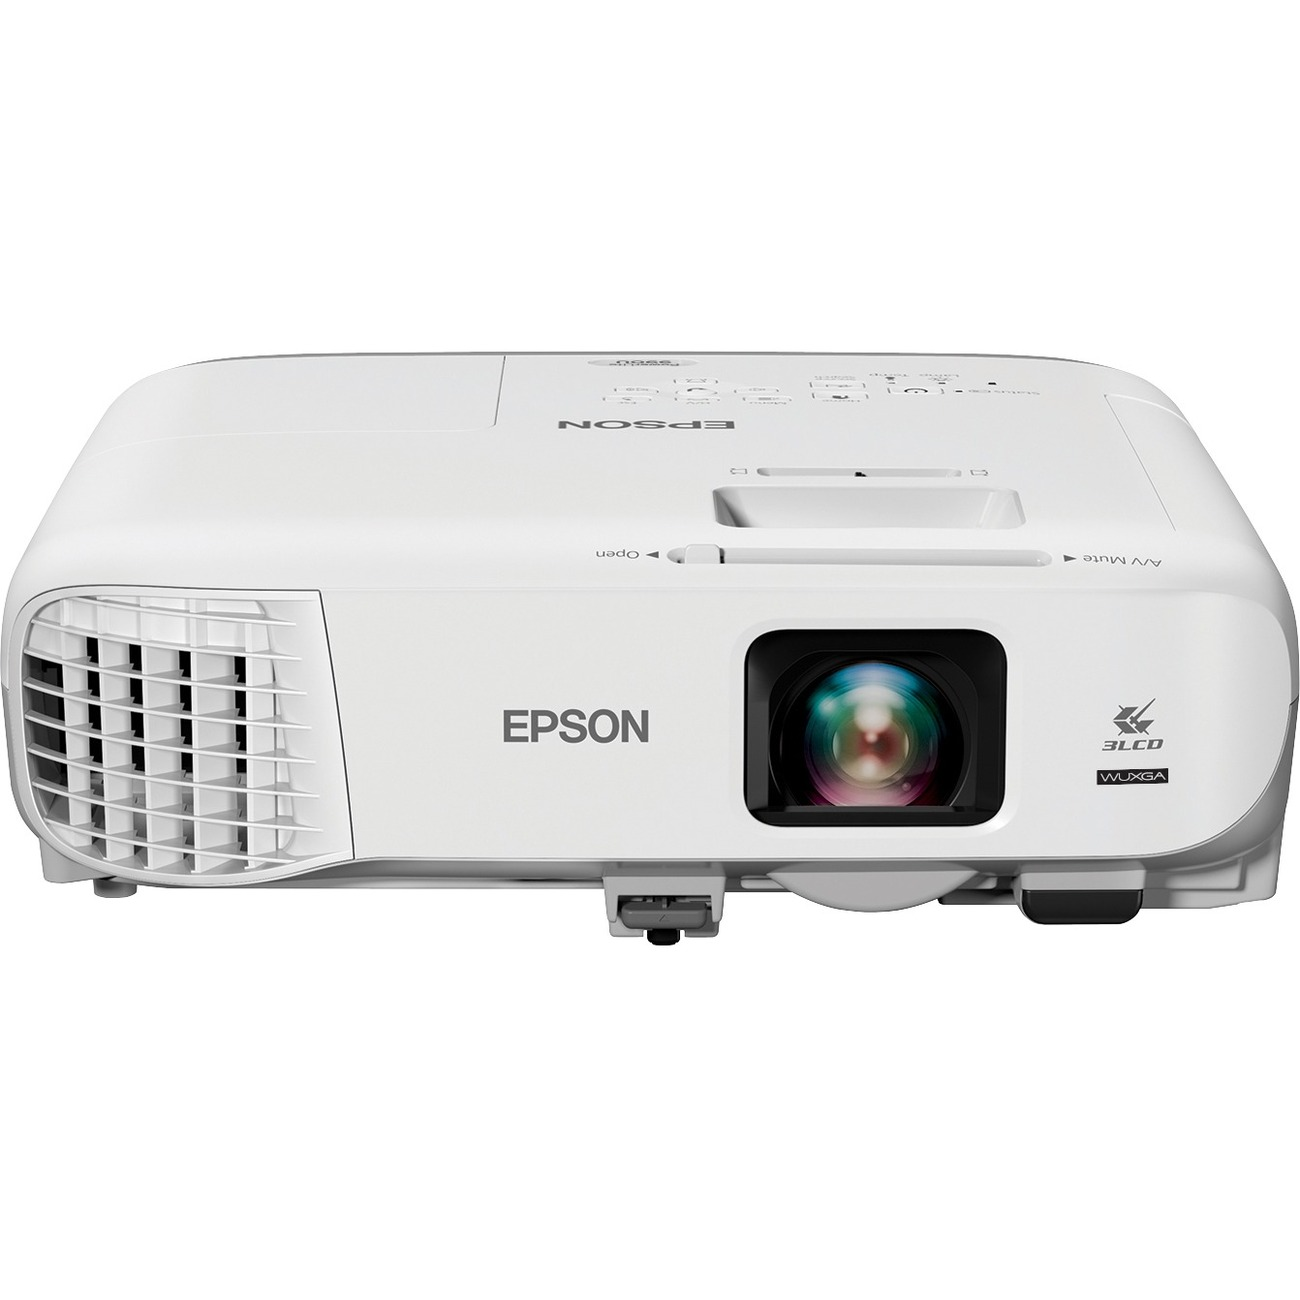 Epson PowerLite 990U LCD Projector - 16:10_subImage_1